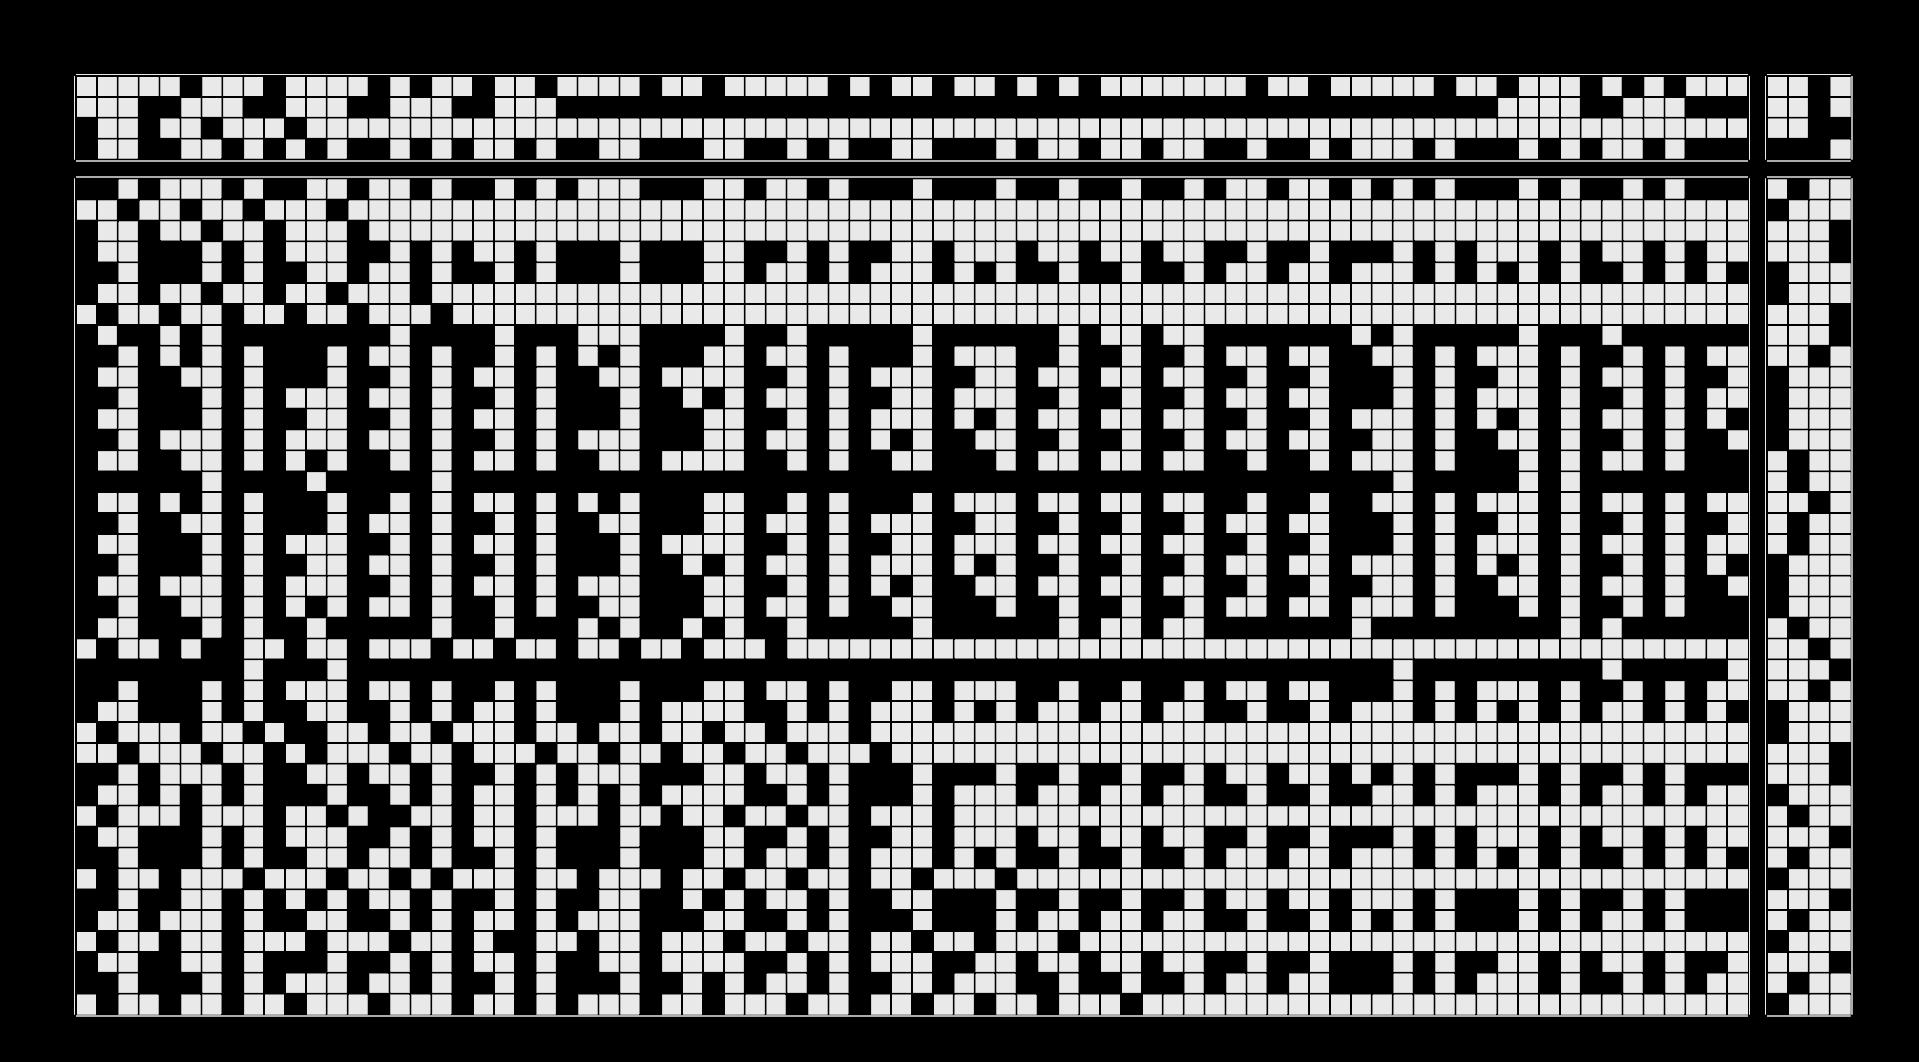 Screenshot_2020-05-07_14-49-50